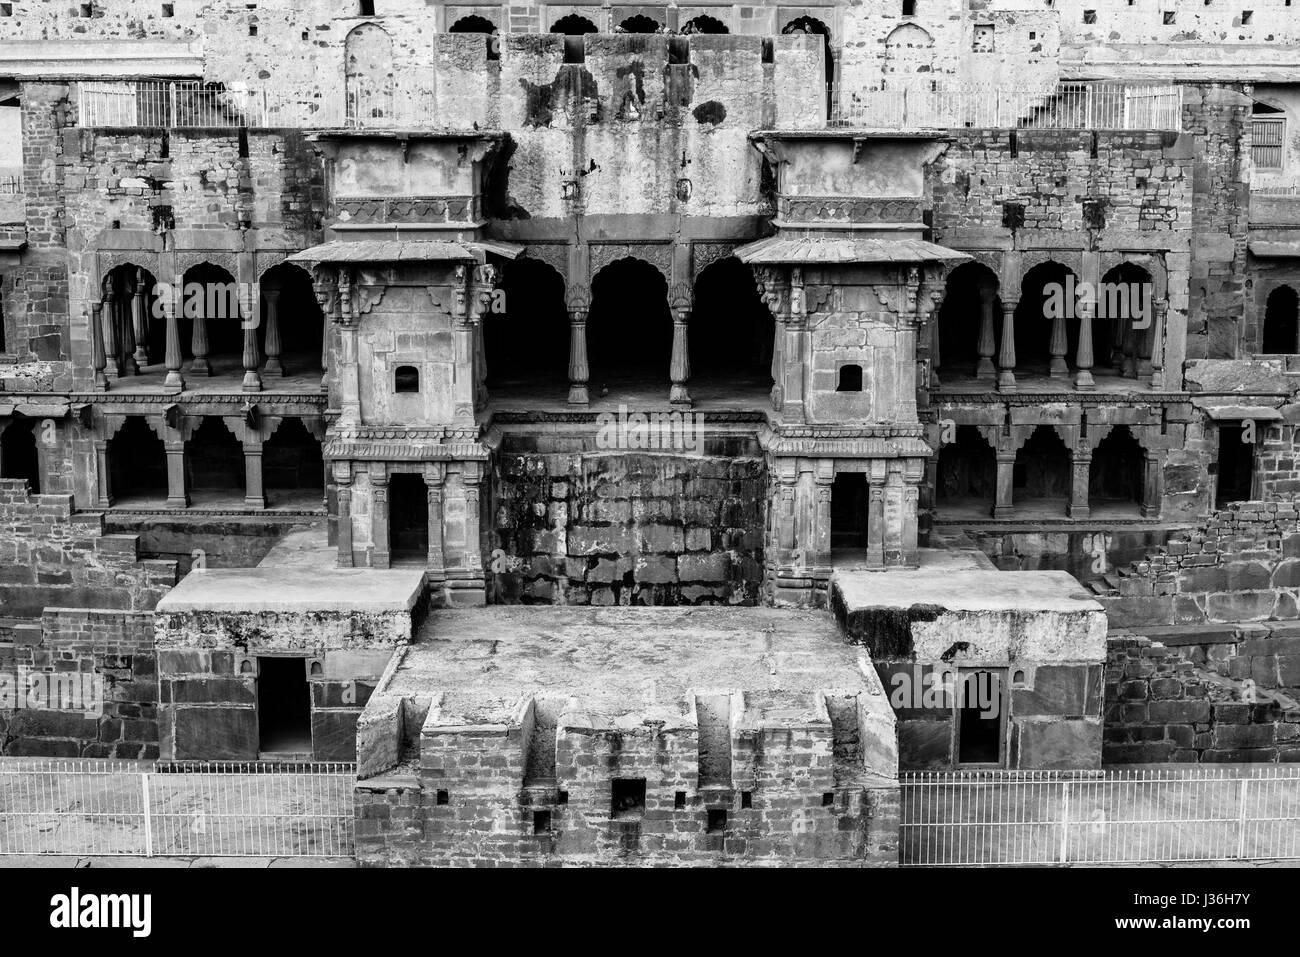 Chand Baori stepwell, Abhaneri, at Jaipur, Rajasthan - Stock Image